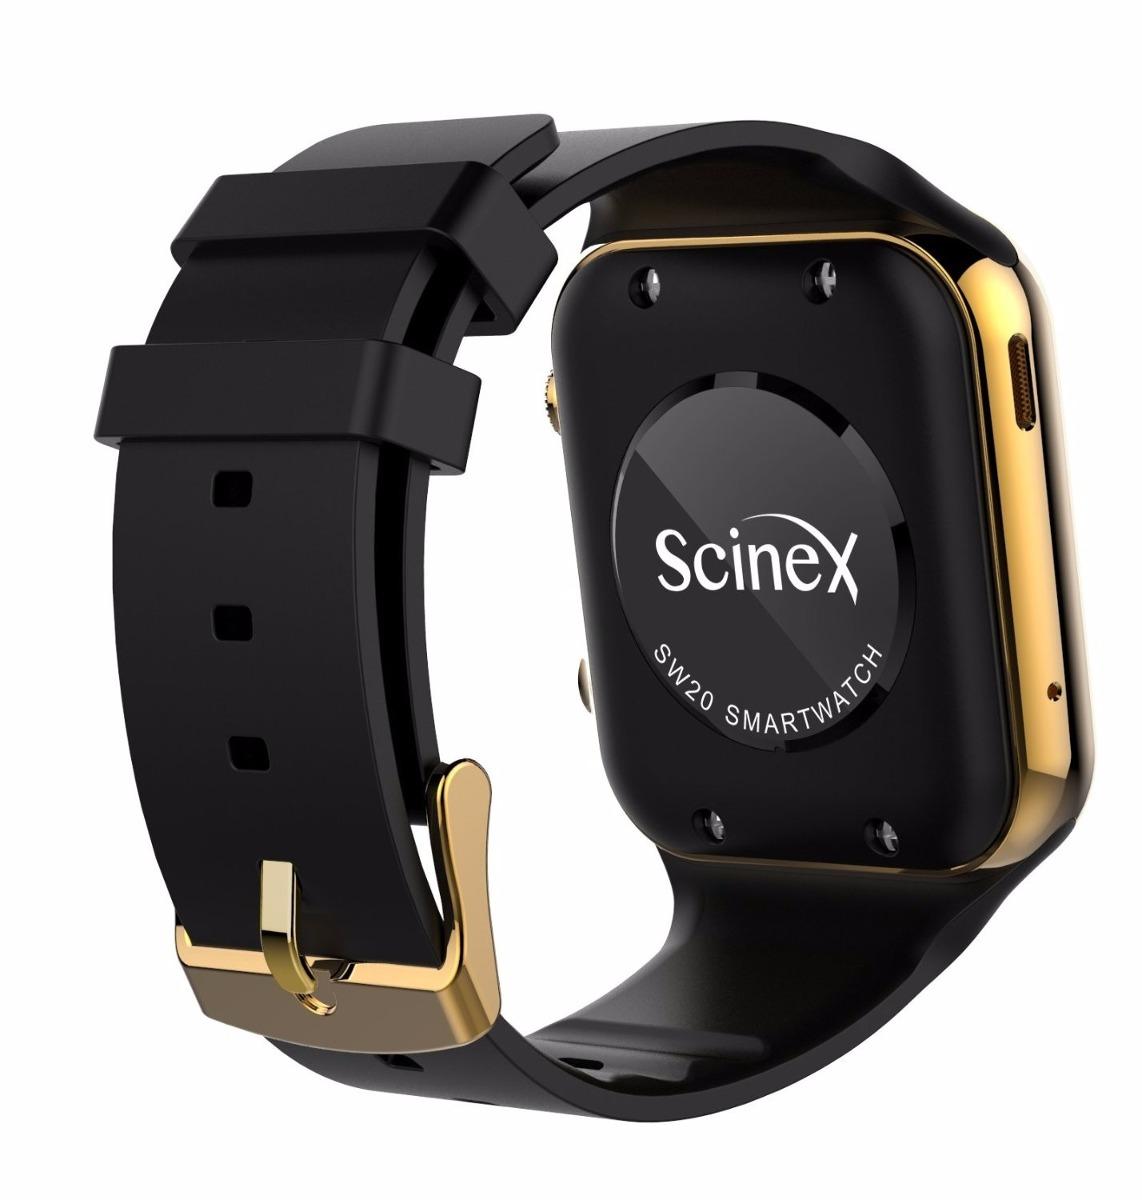 Reloj smart watch scinex sw20 color oro negro 3 for Portent g3 sw 12